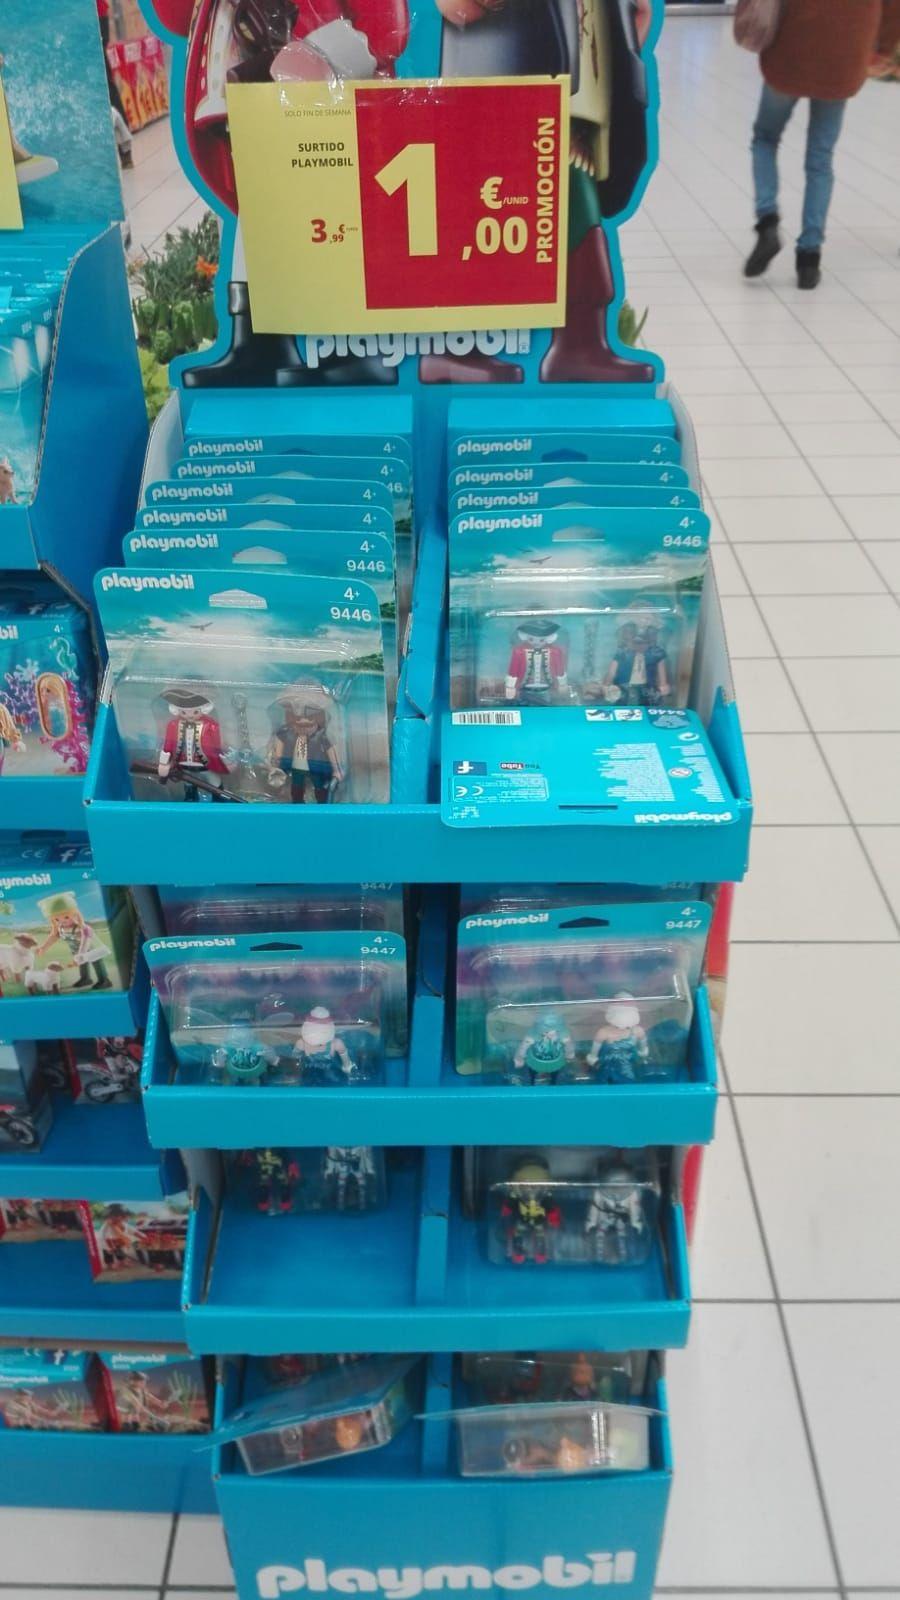 Playmobil 1€ | Alcampo de Colmenar Viejo